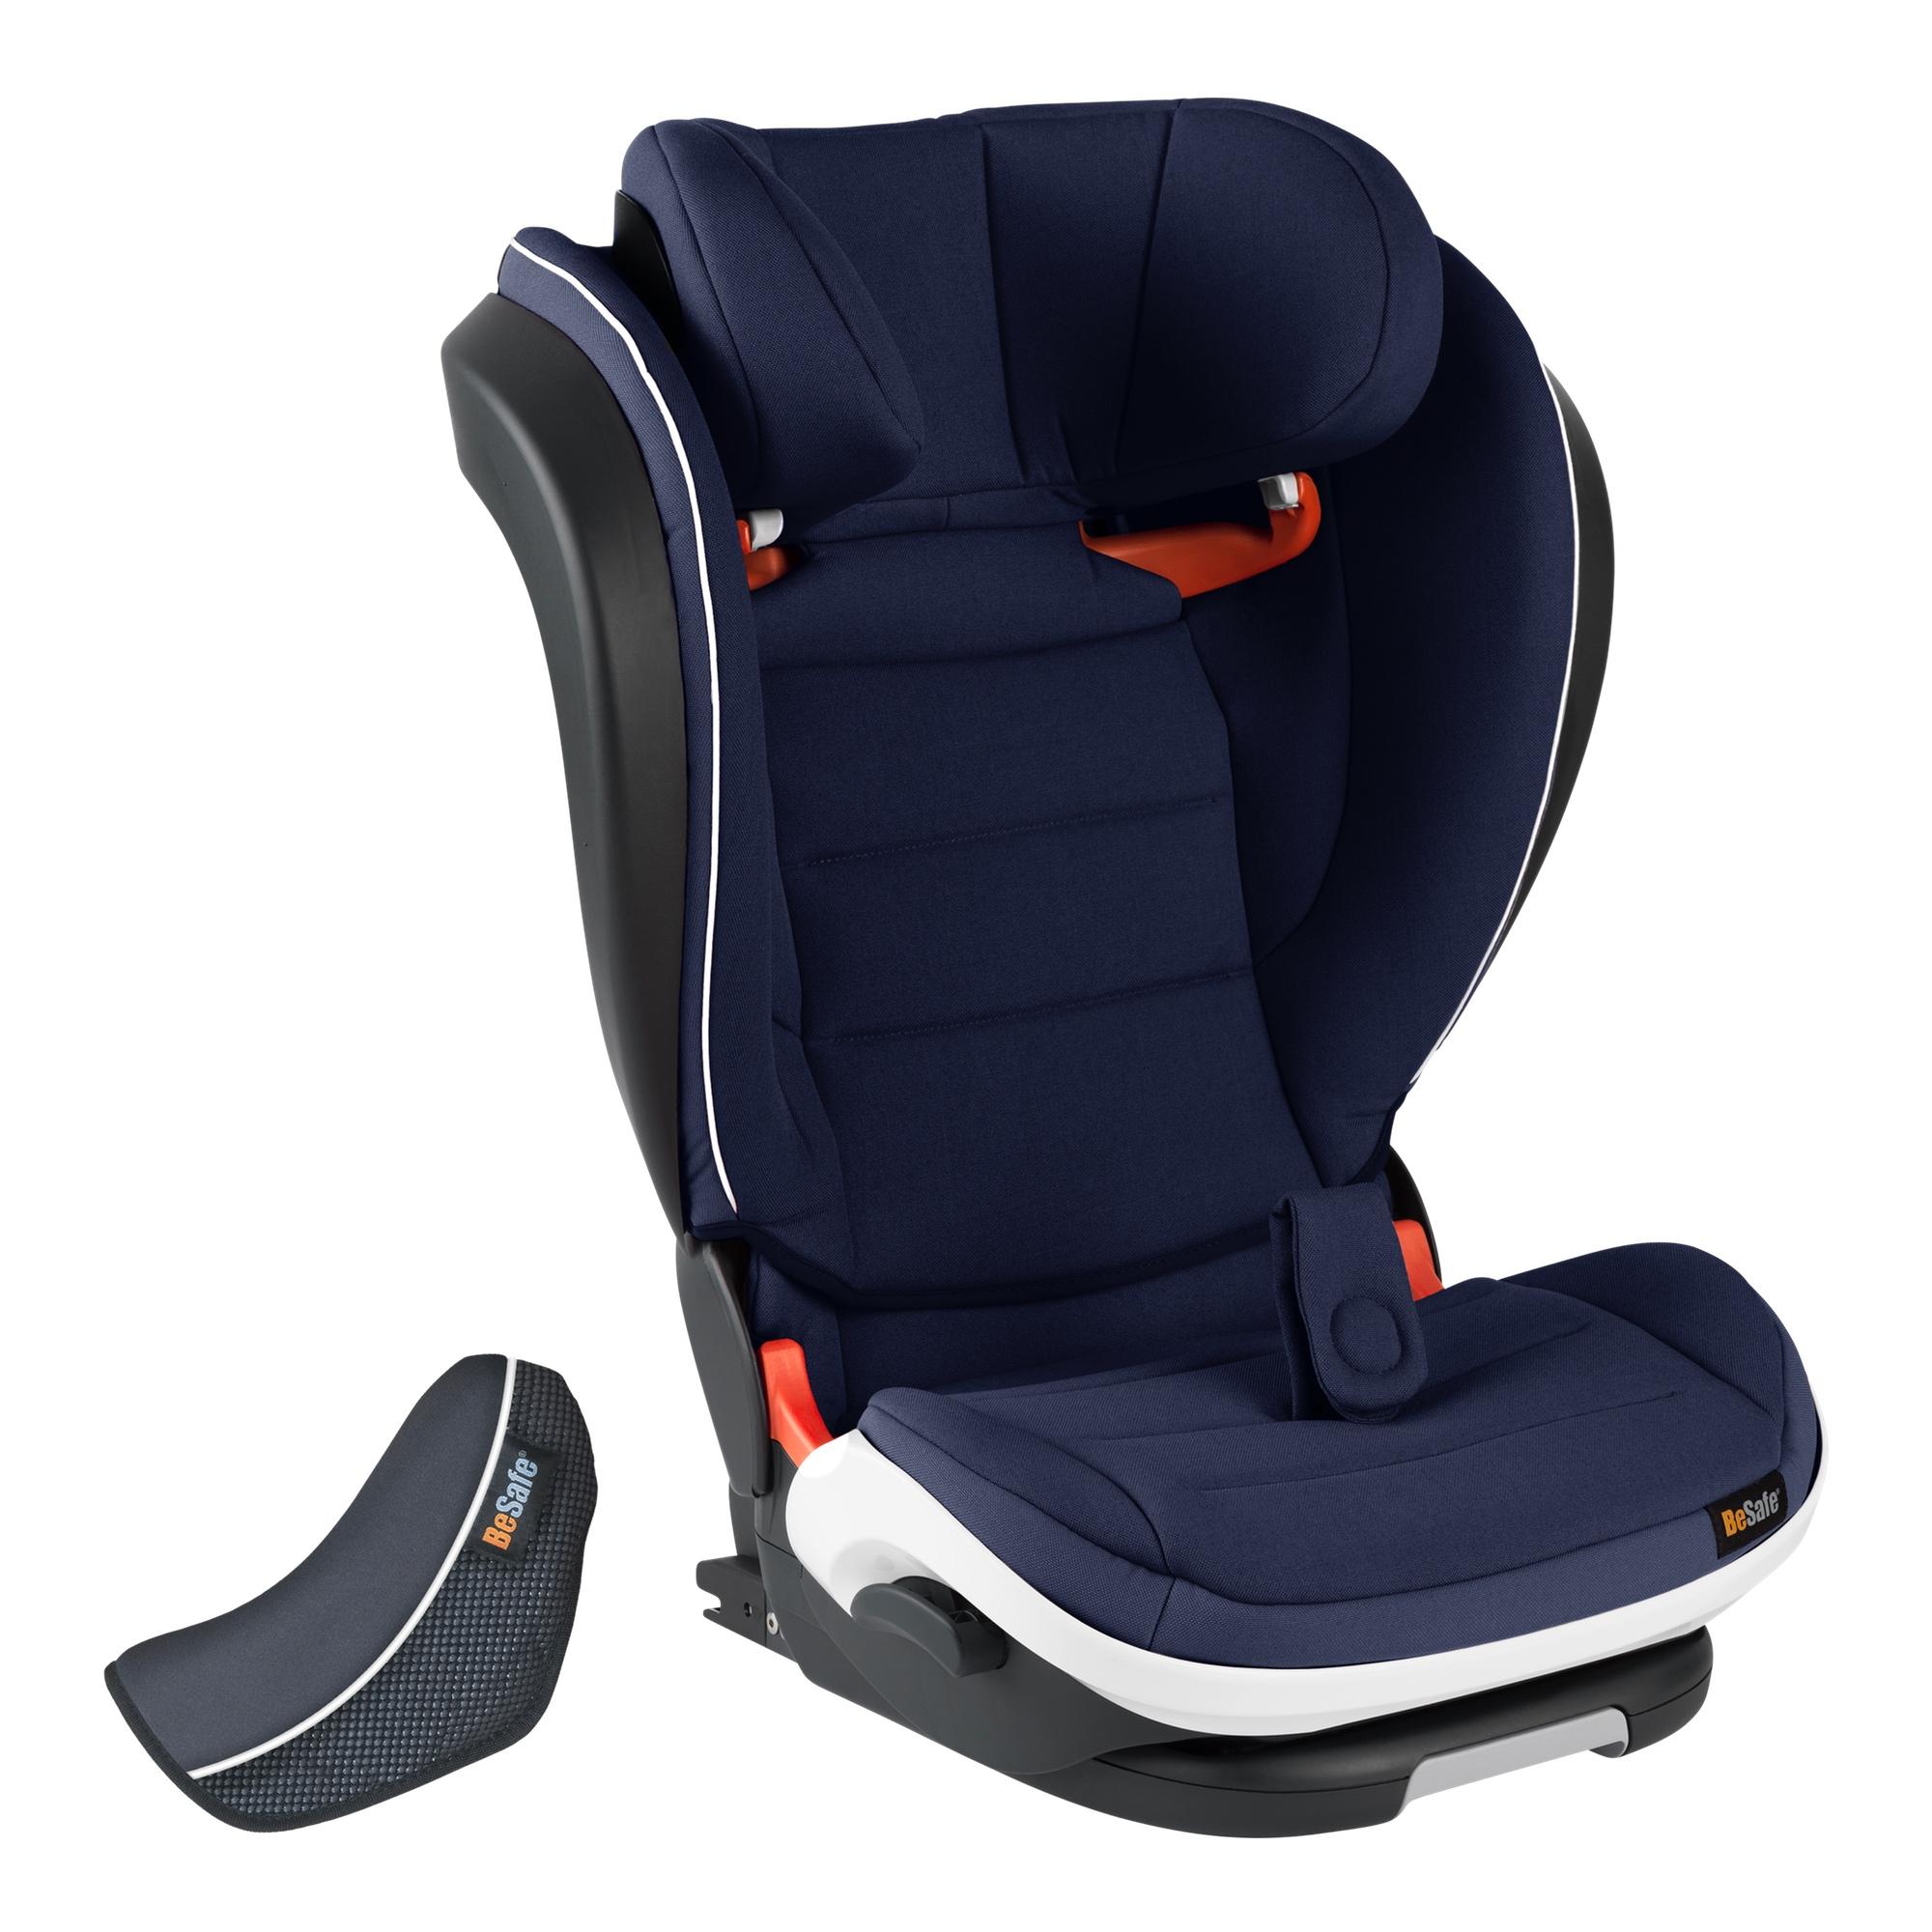 kindersitz 15 36kg die zwergperten babyschalen reboarder kindersitze. Black Bedroom Furniture Sets. Home Design Ideas